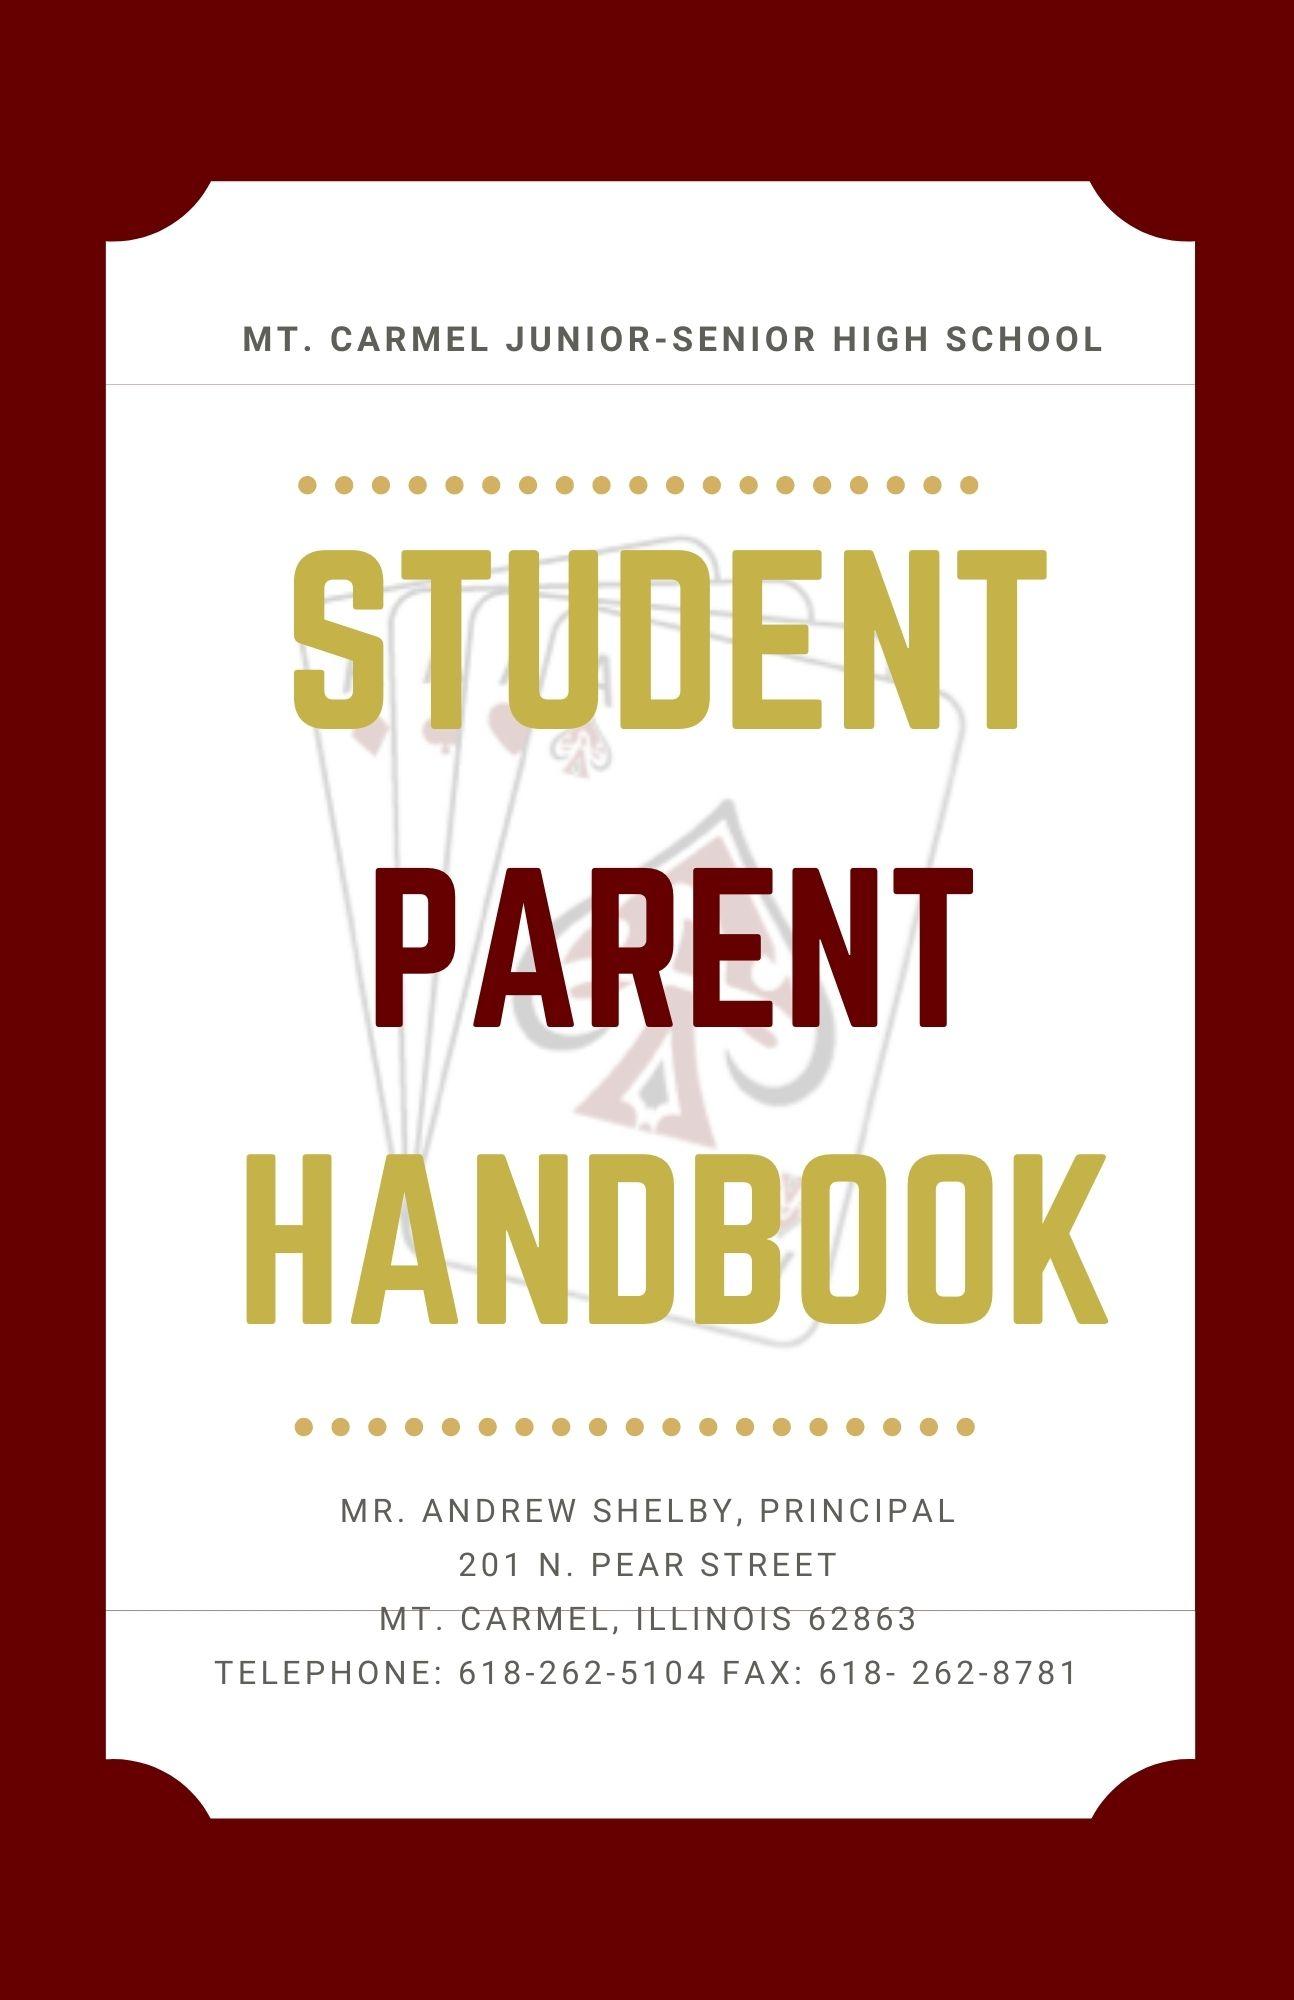 MCJSHS Parent Student Handbook